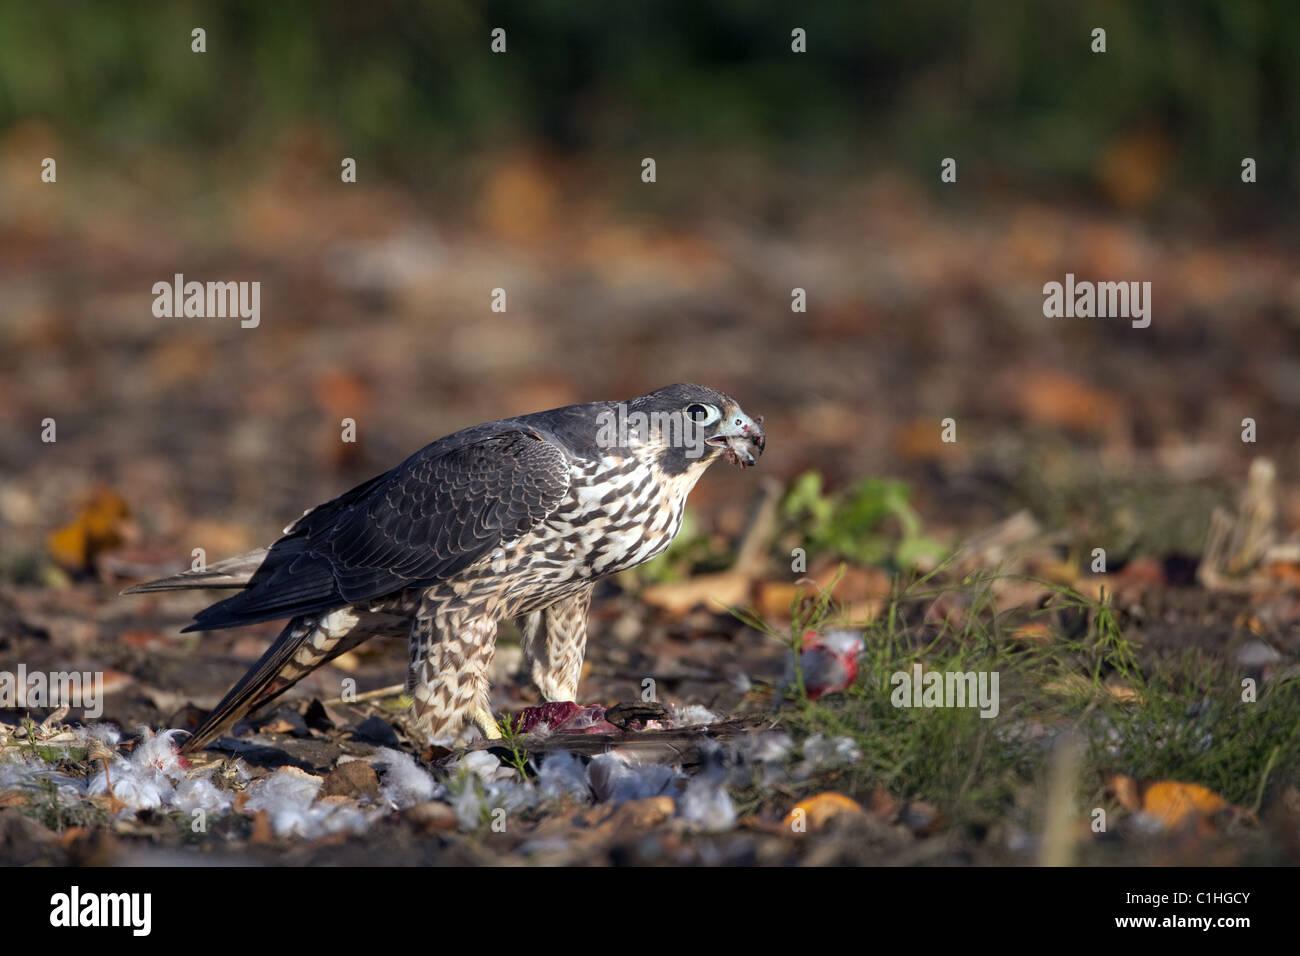 Peregrine Falcon with prey - Stock Image